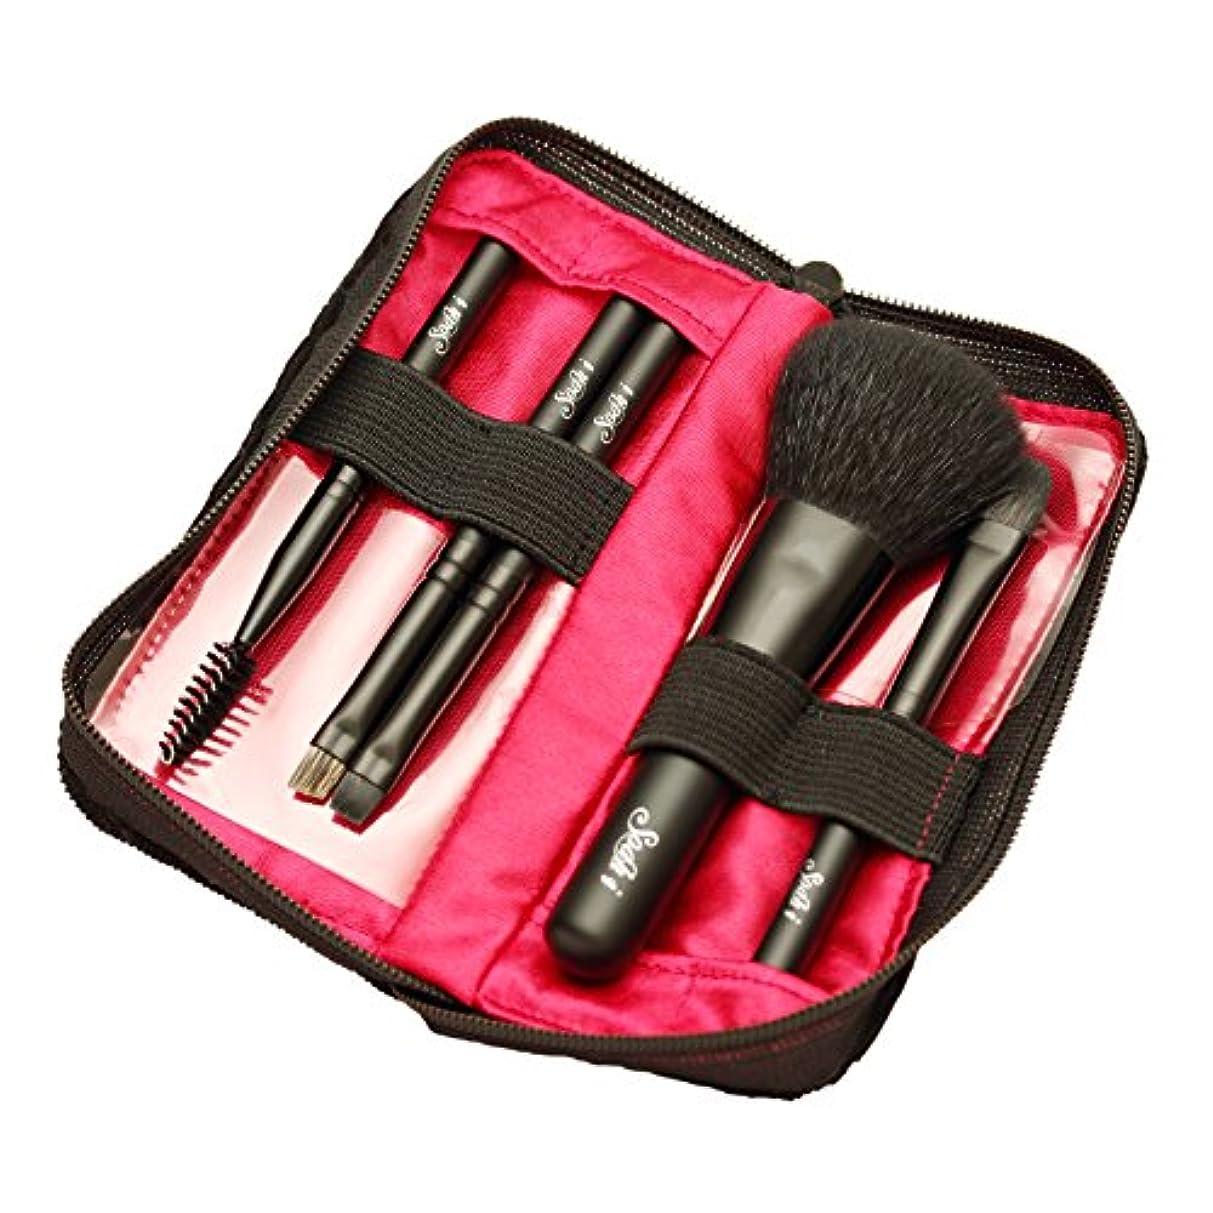 理容室旅客安全豊橋化粧筆 匠 By Soah i petit make up brush set